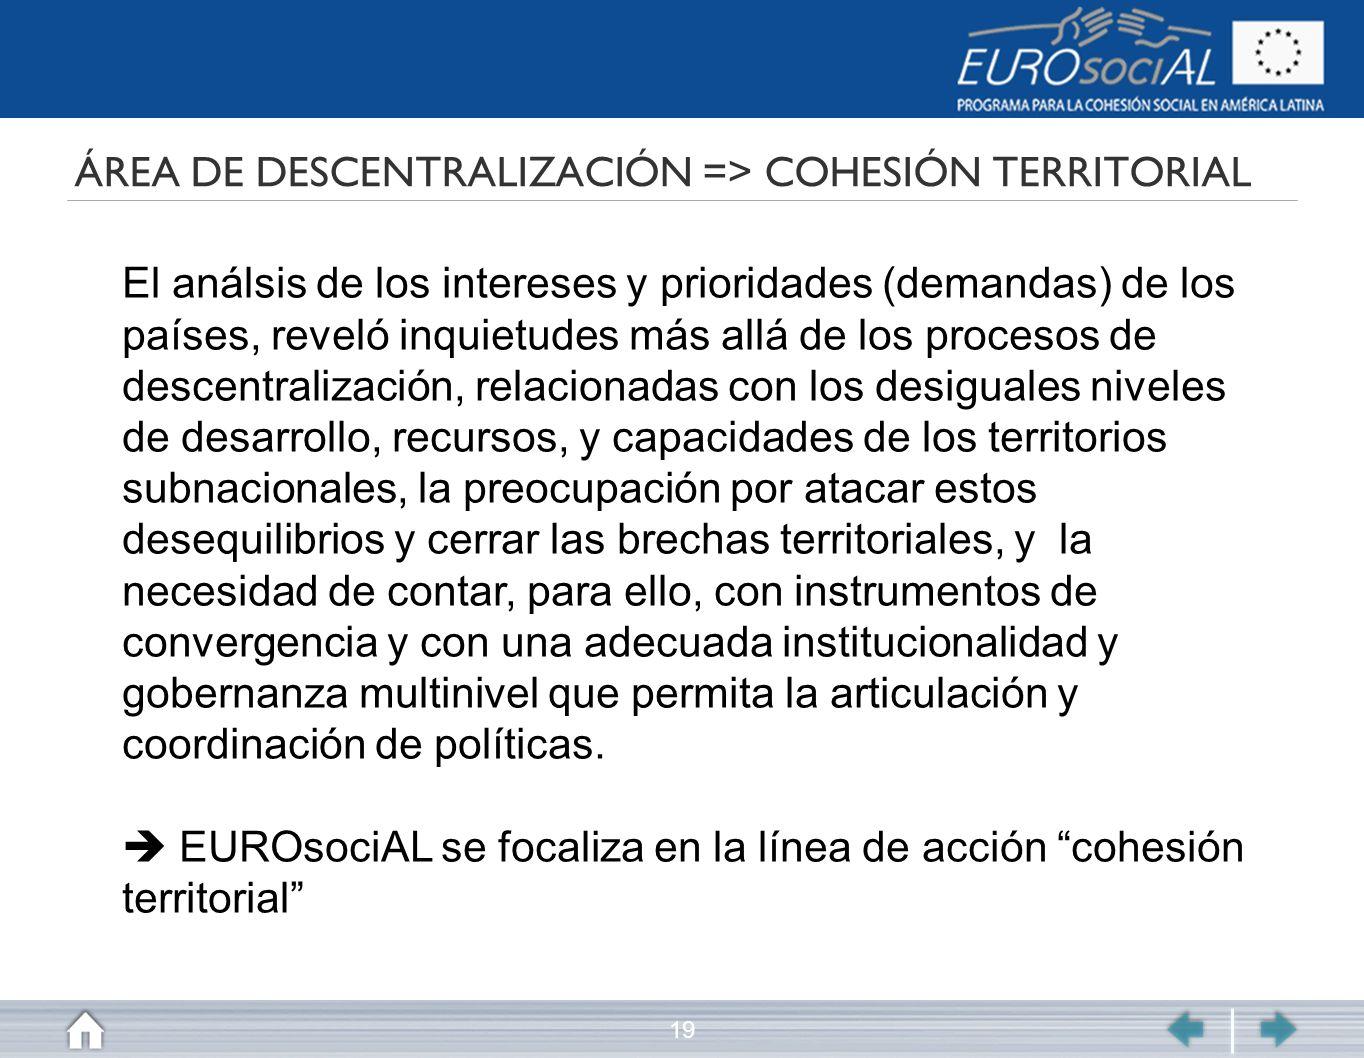 ÁREA DE DESCENTRALIZACIÓN => COHESIÓN TERRITORIAL